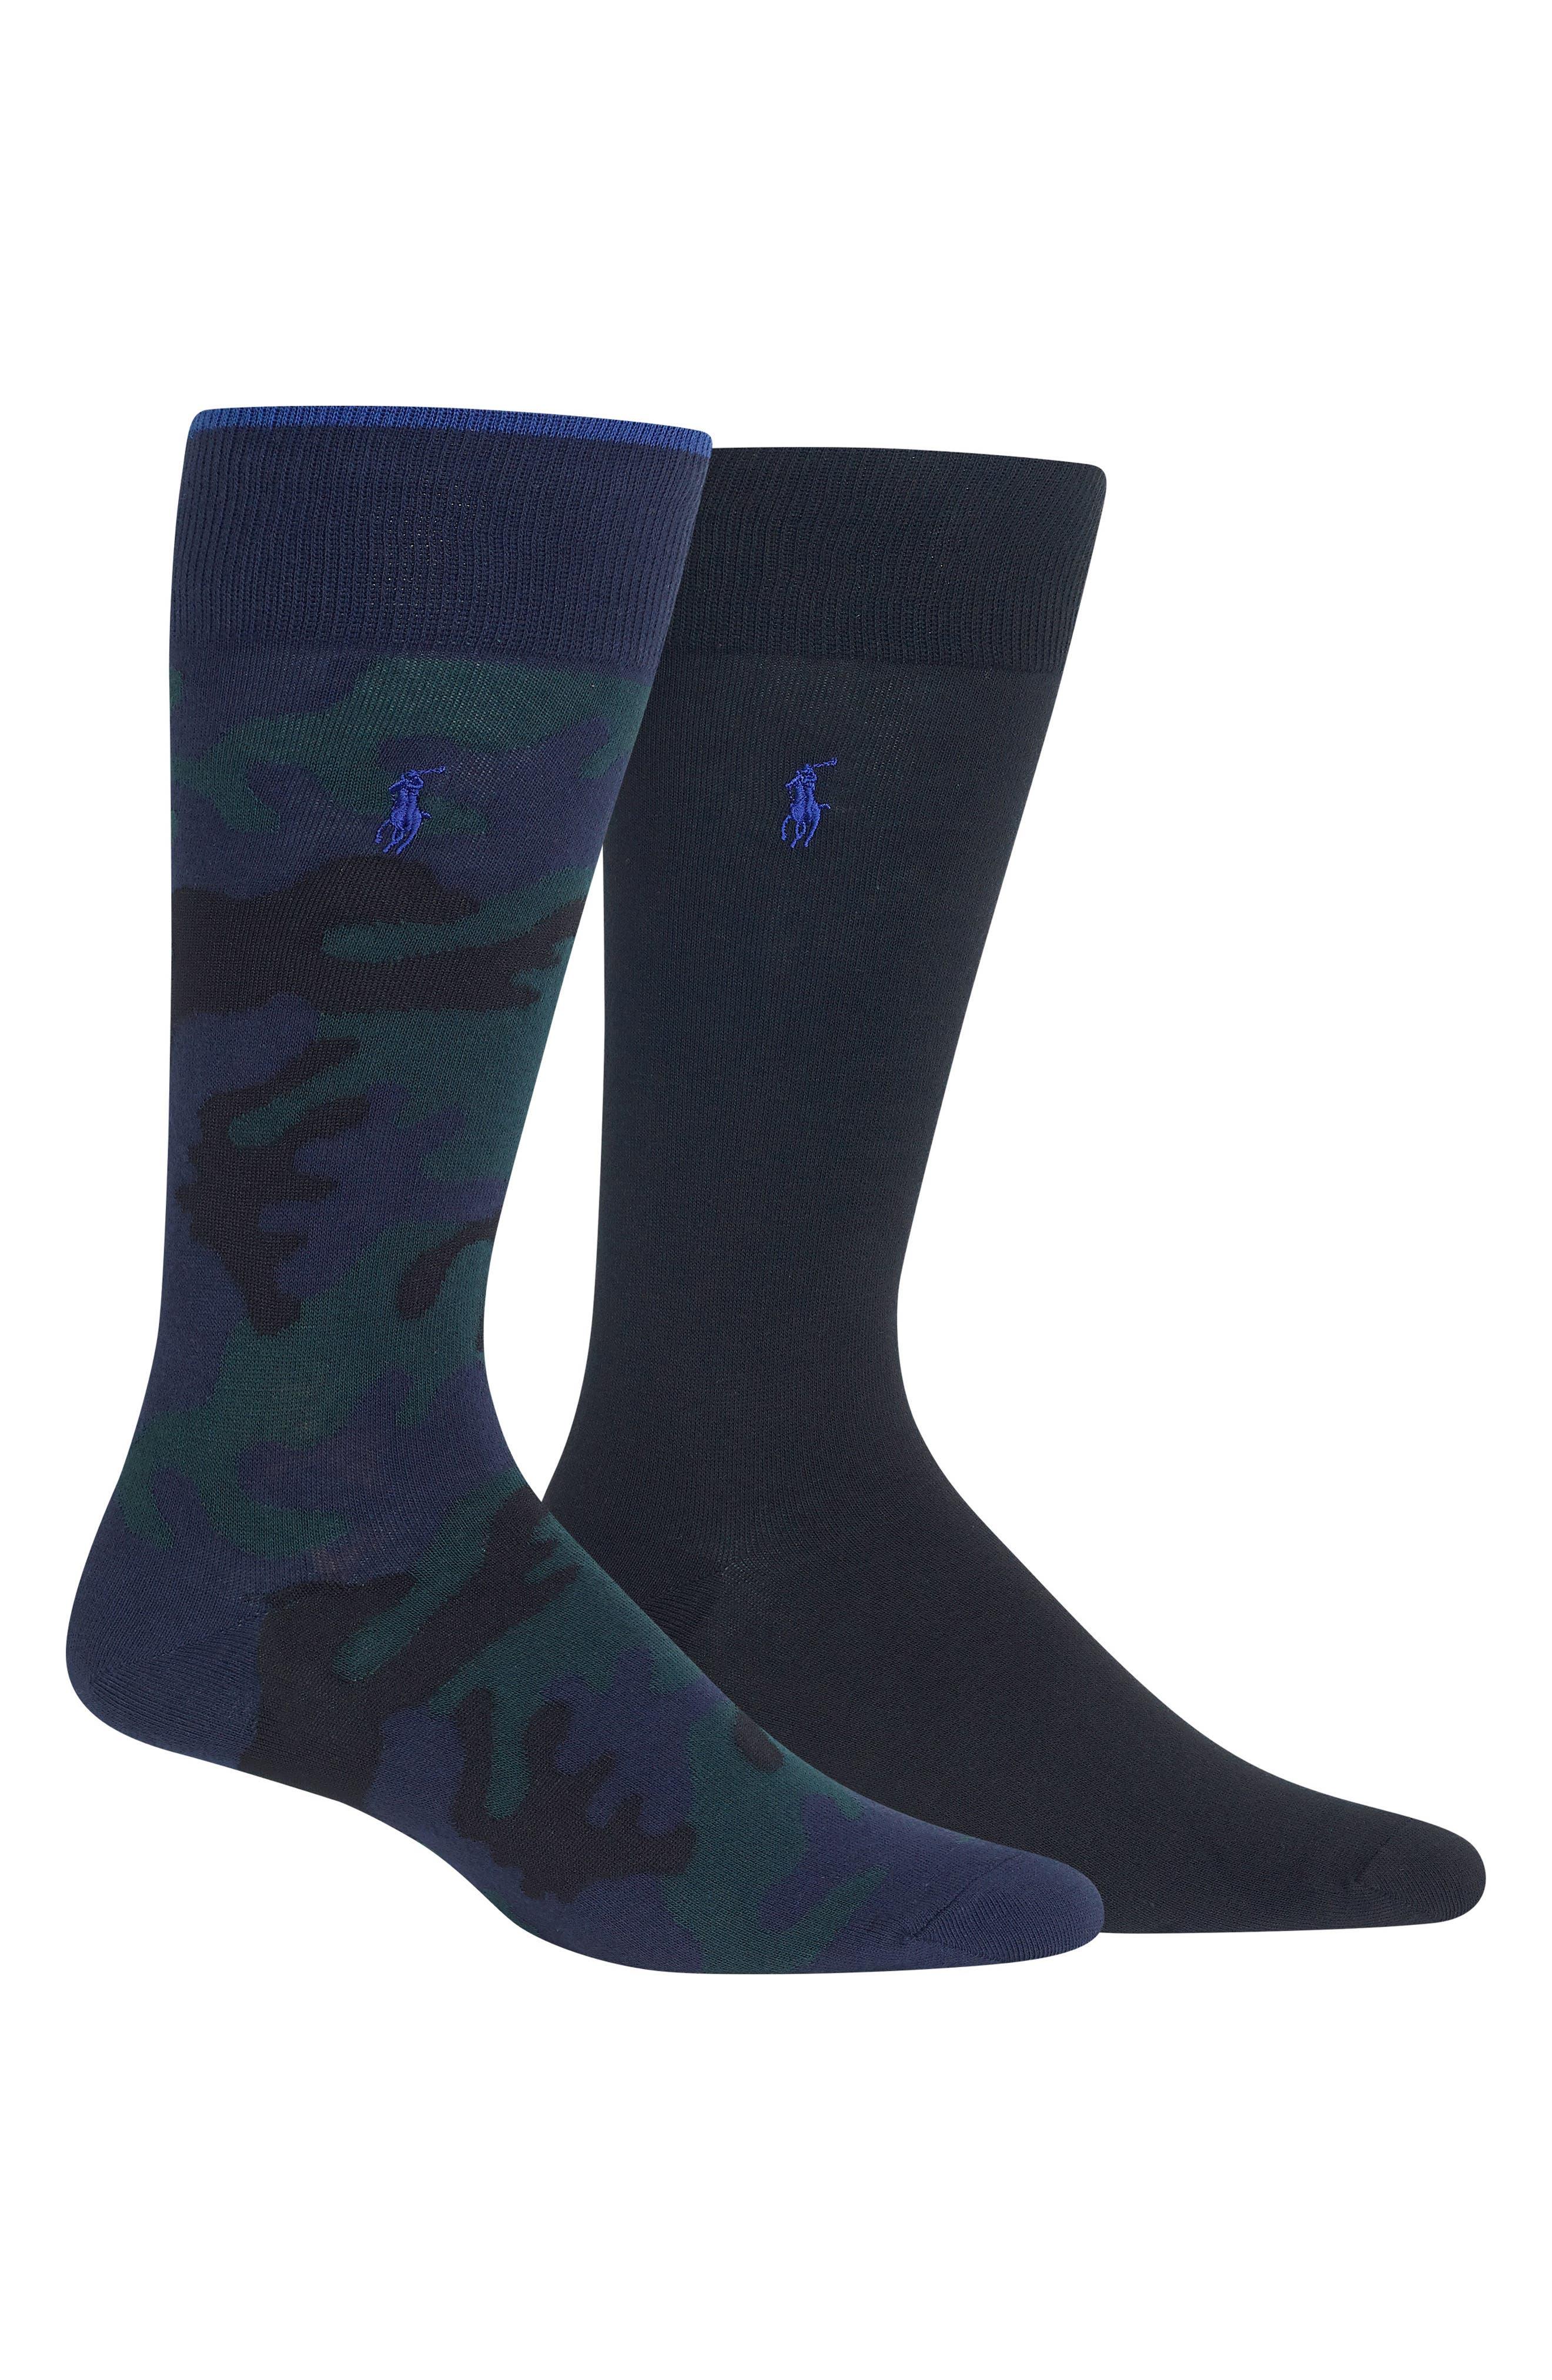 2-Pack Camo & Solid Socks,                             Main thumbnail 1, color,                             NAVY